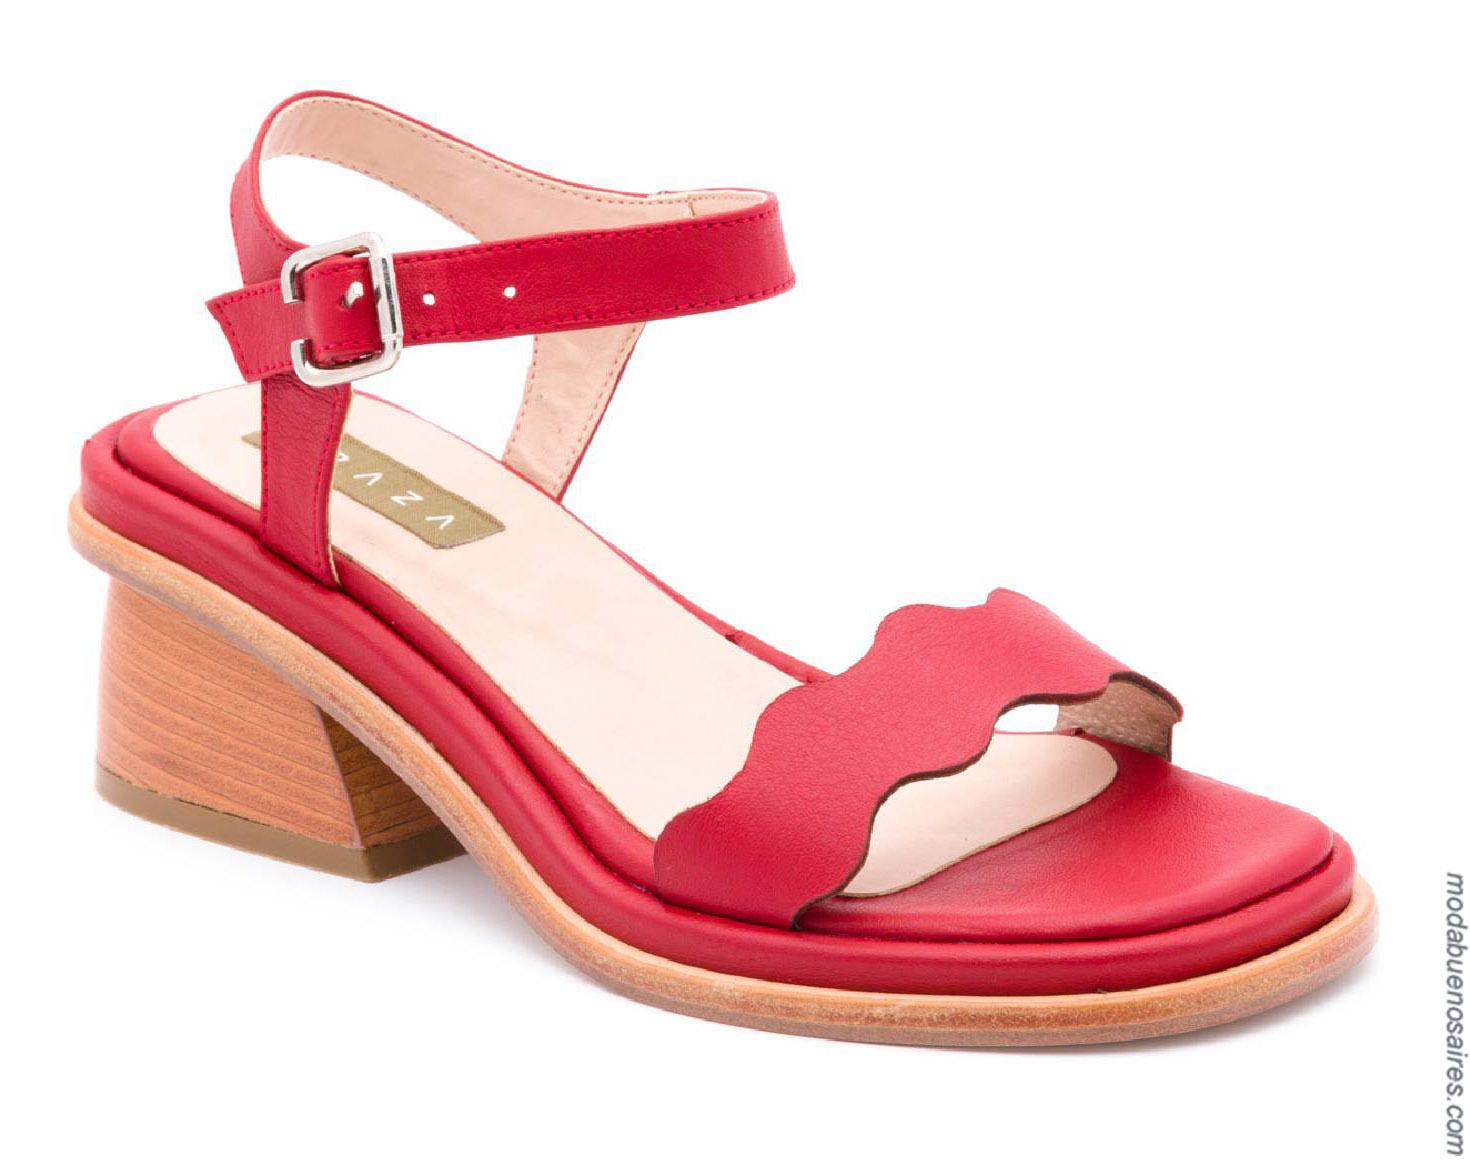 Moda calzados primavera verano 2020. Sandalias primavera verano 2020.